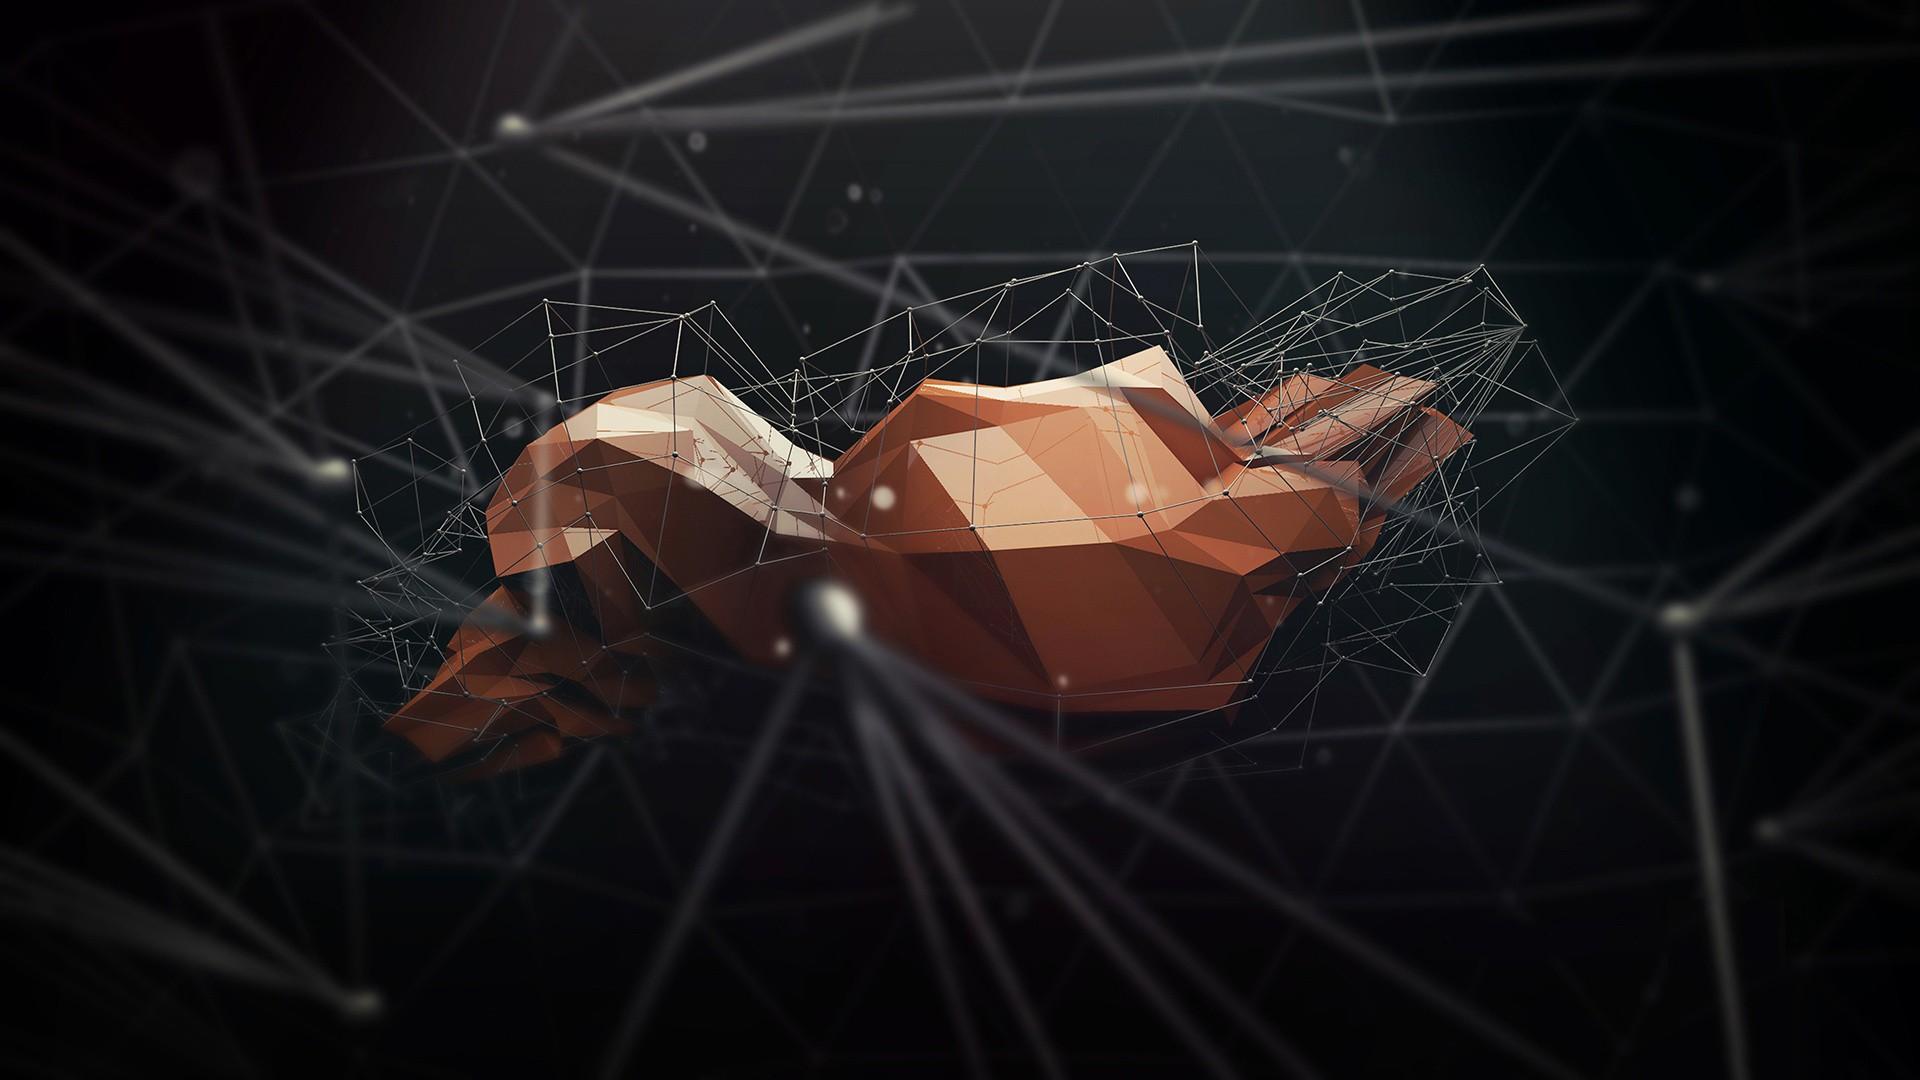 Amazing Wallpaper Mountain Polygon - 2491a5c32852bd08058bcbb3c2b42550  Image_416452.jpg